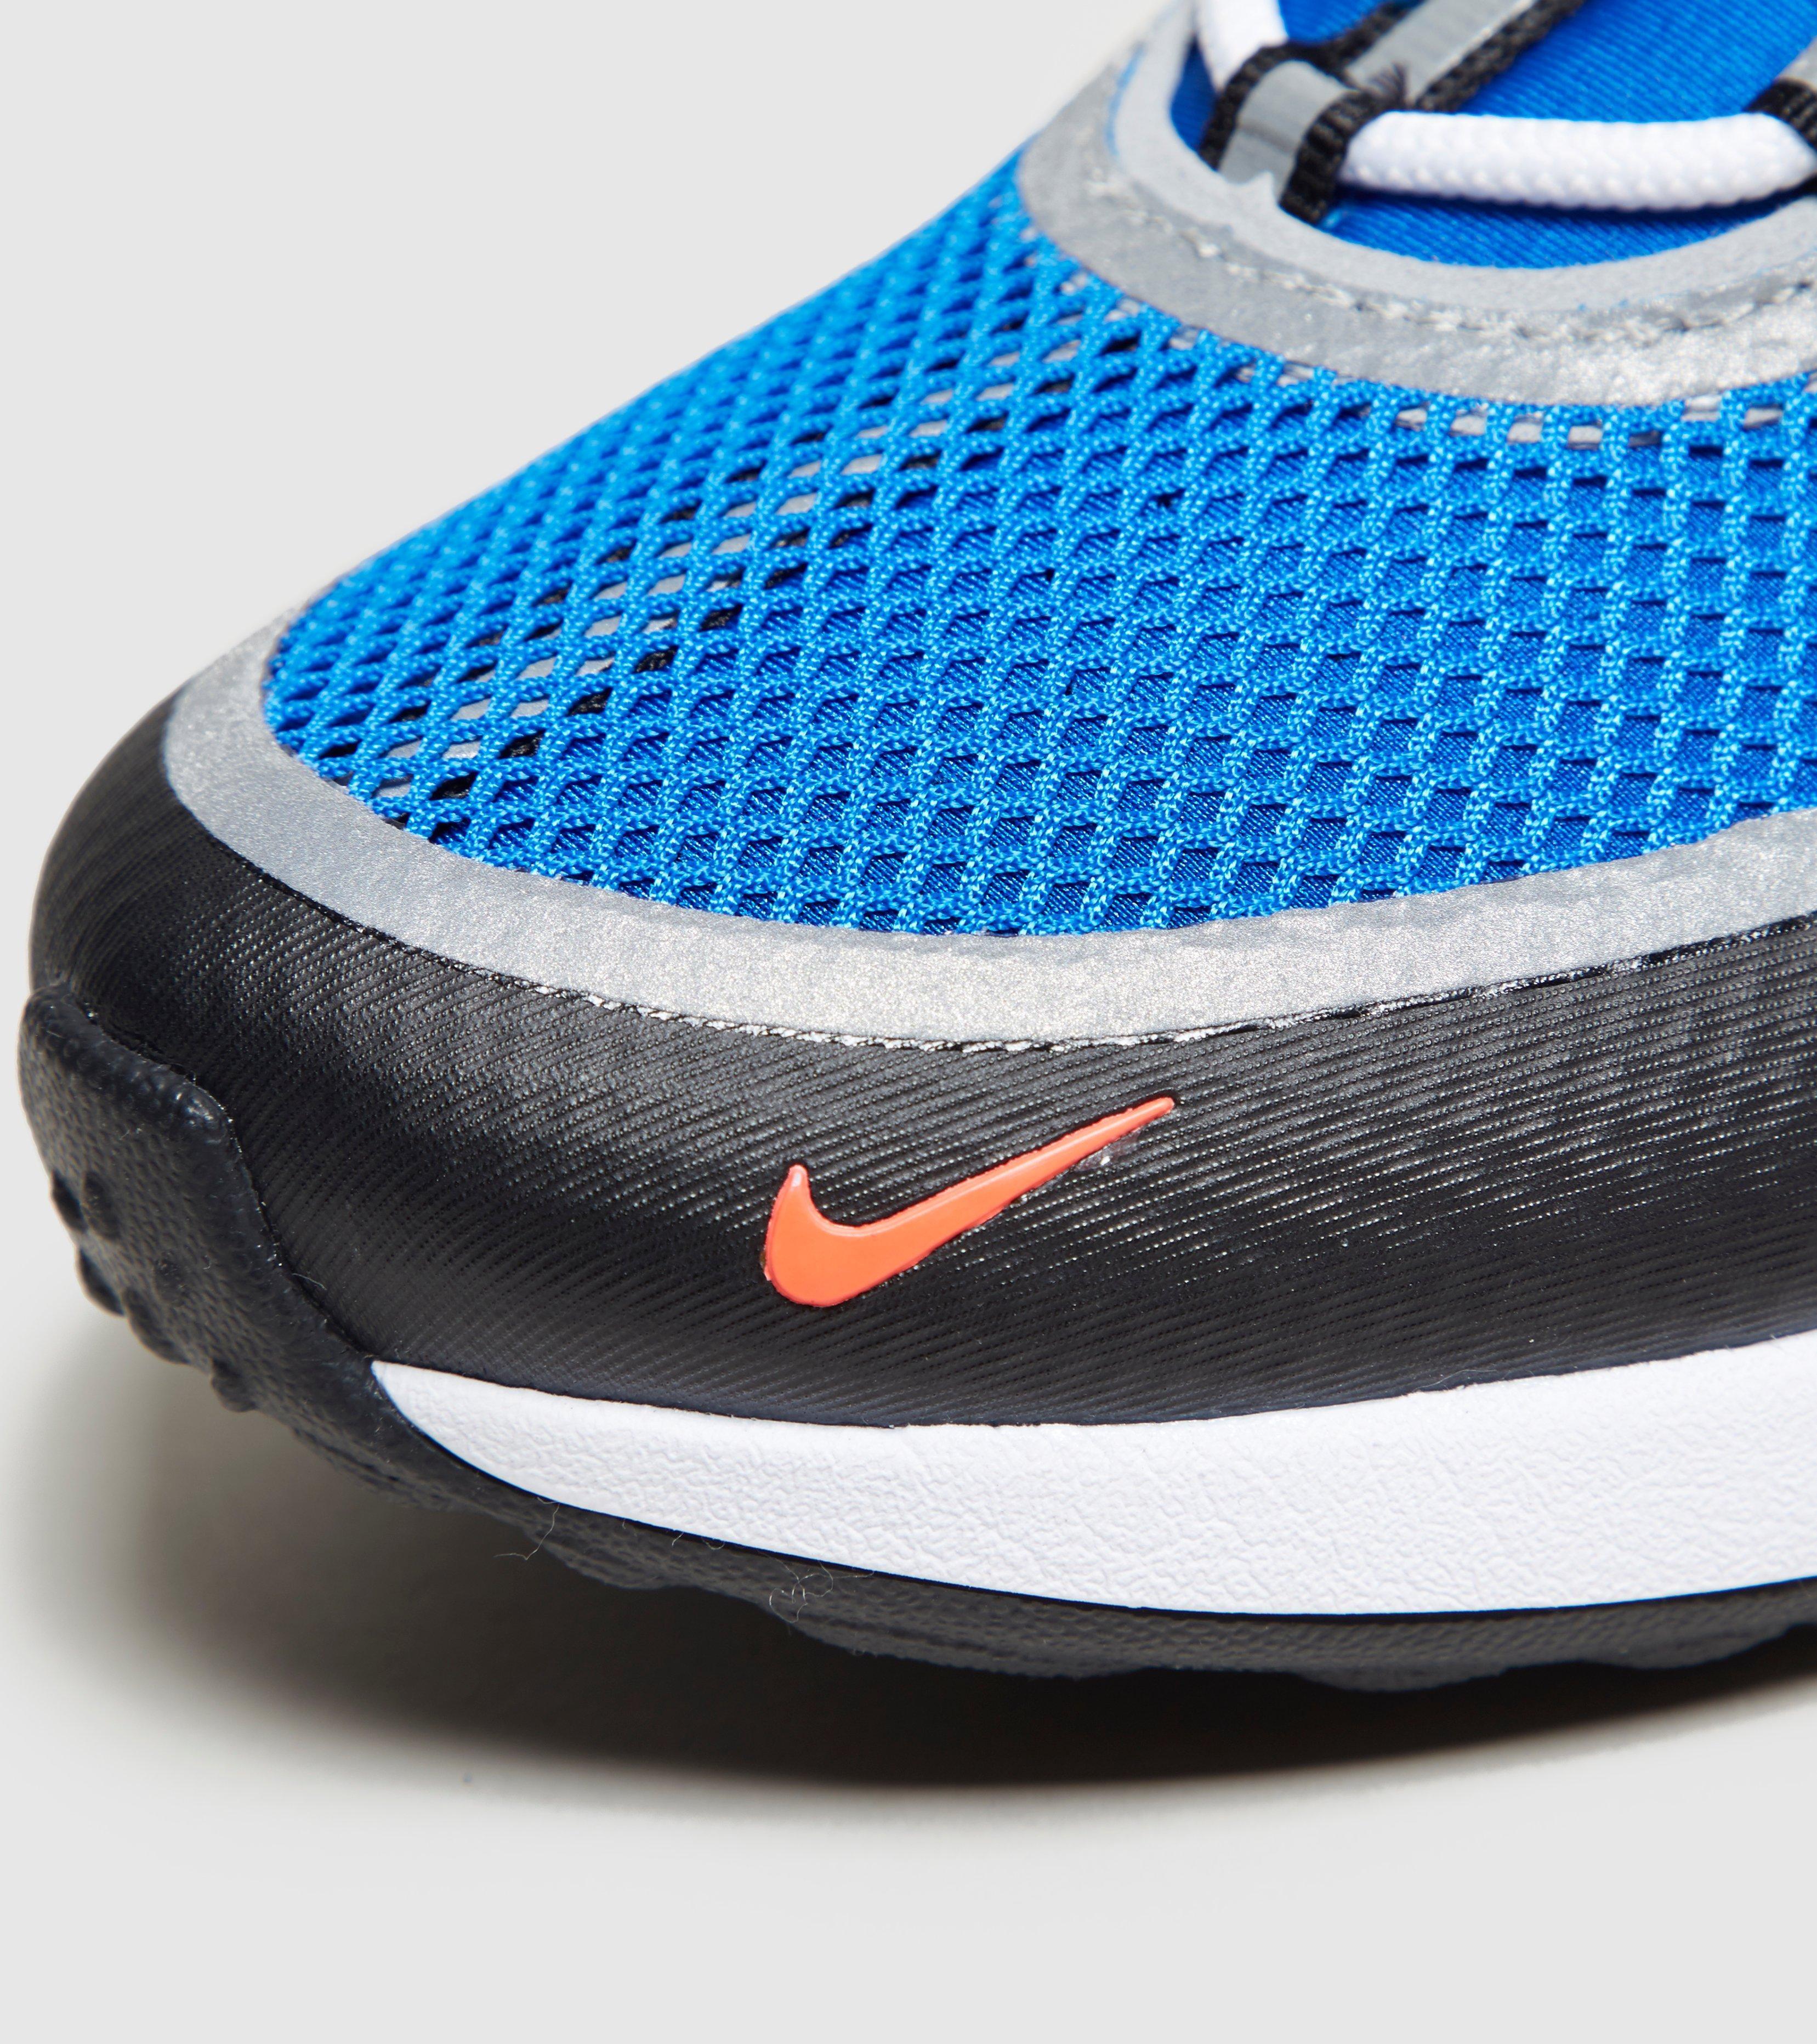 f54457533fbc Nike Air Zoom Spiridon Ultra in Blue for Men - Lyst